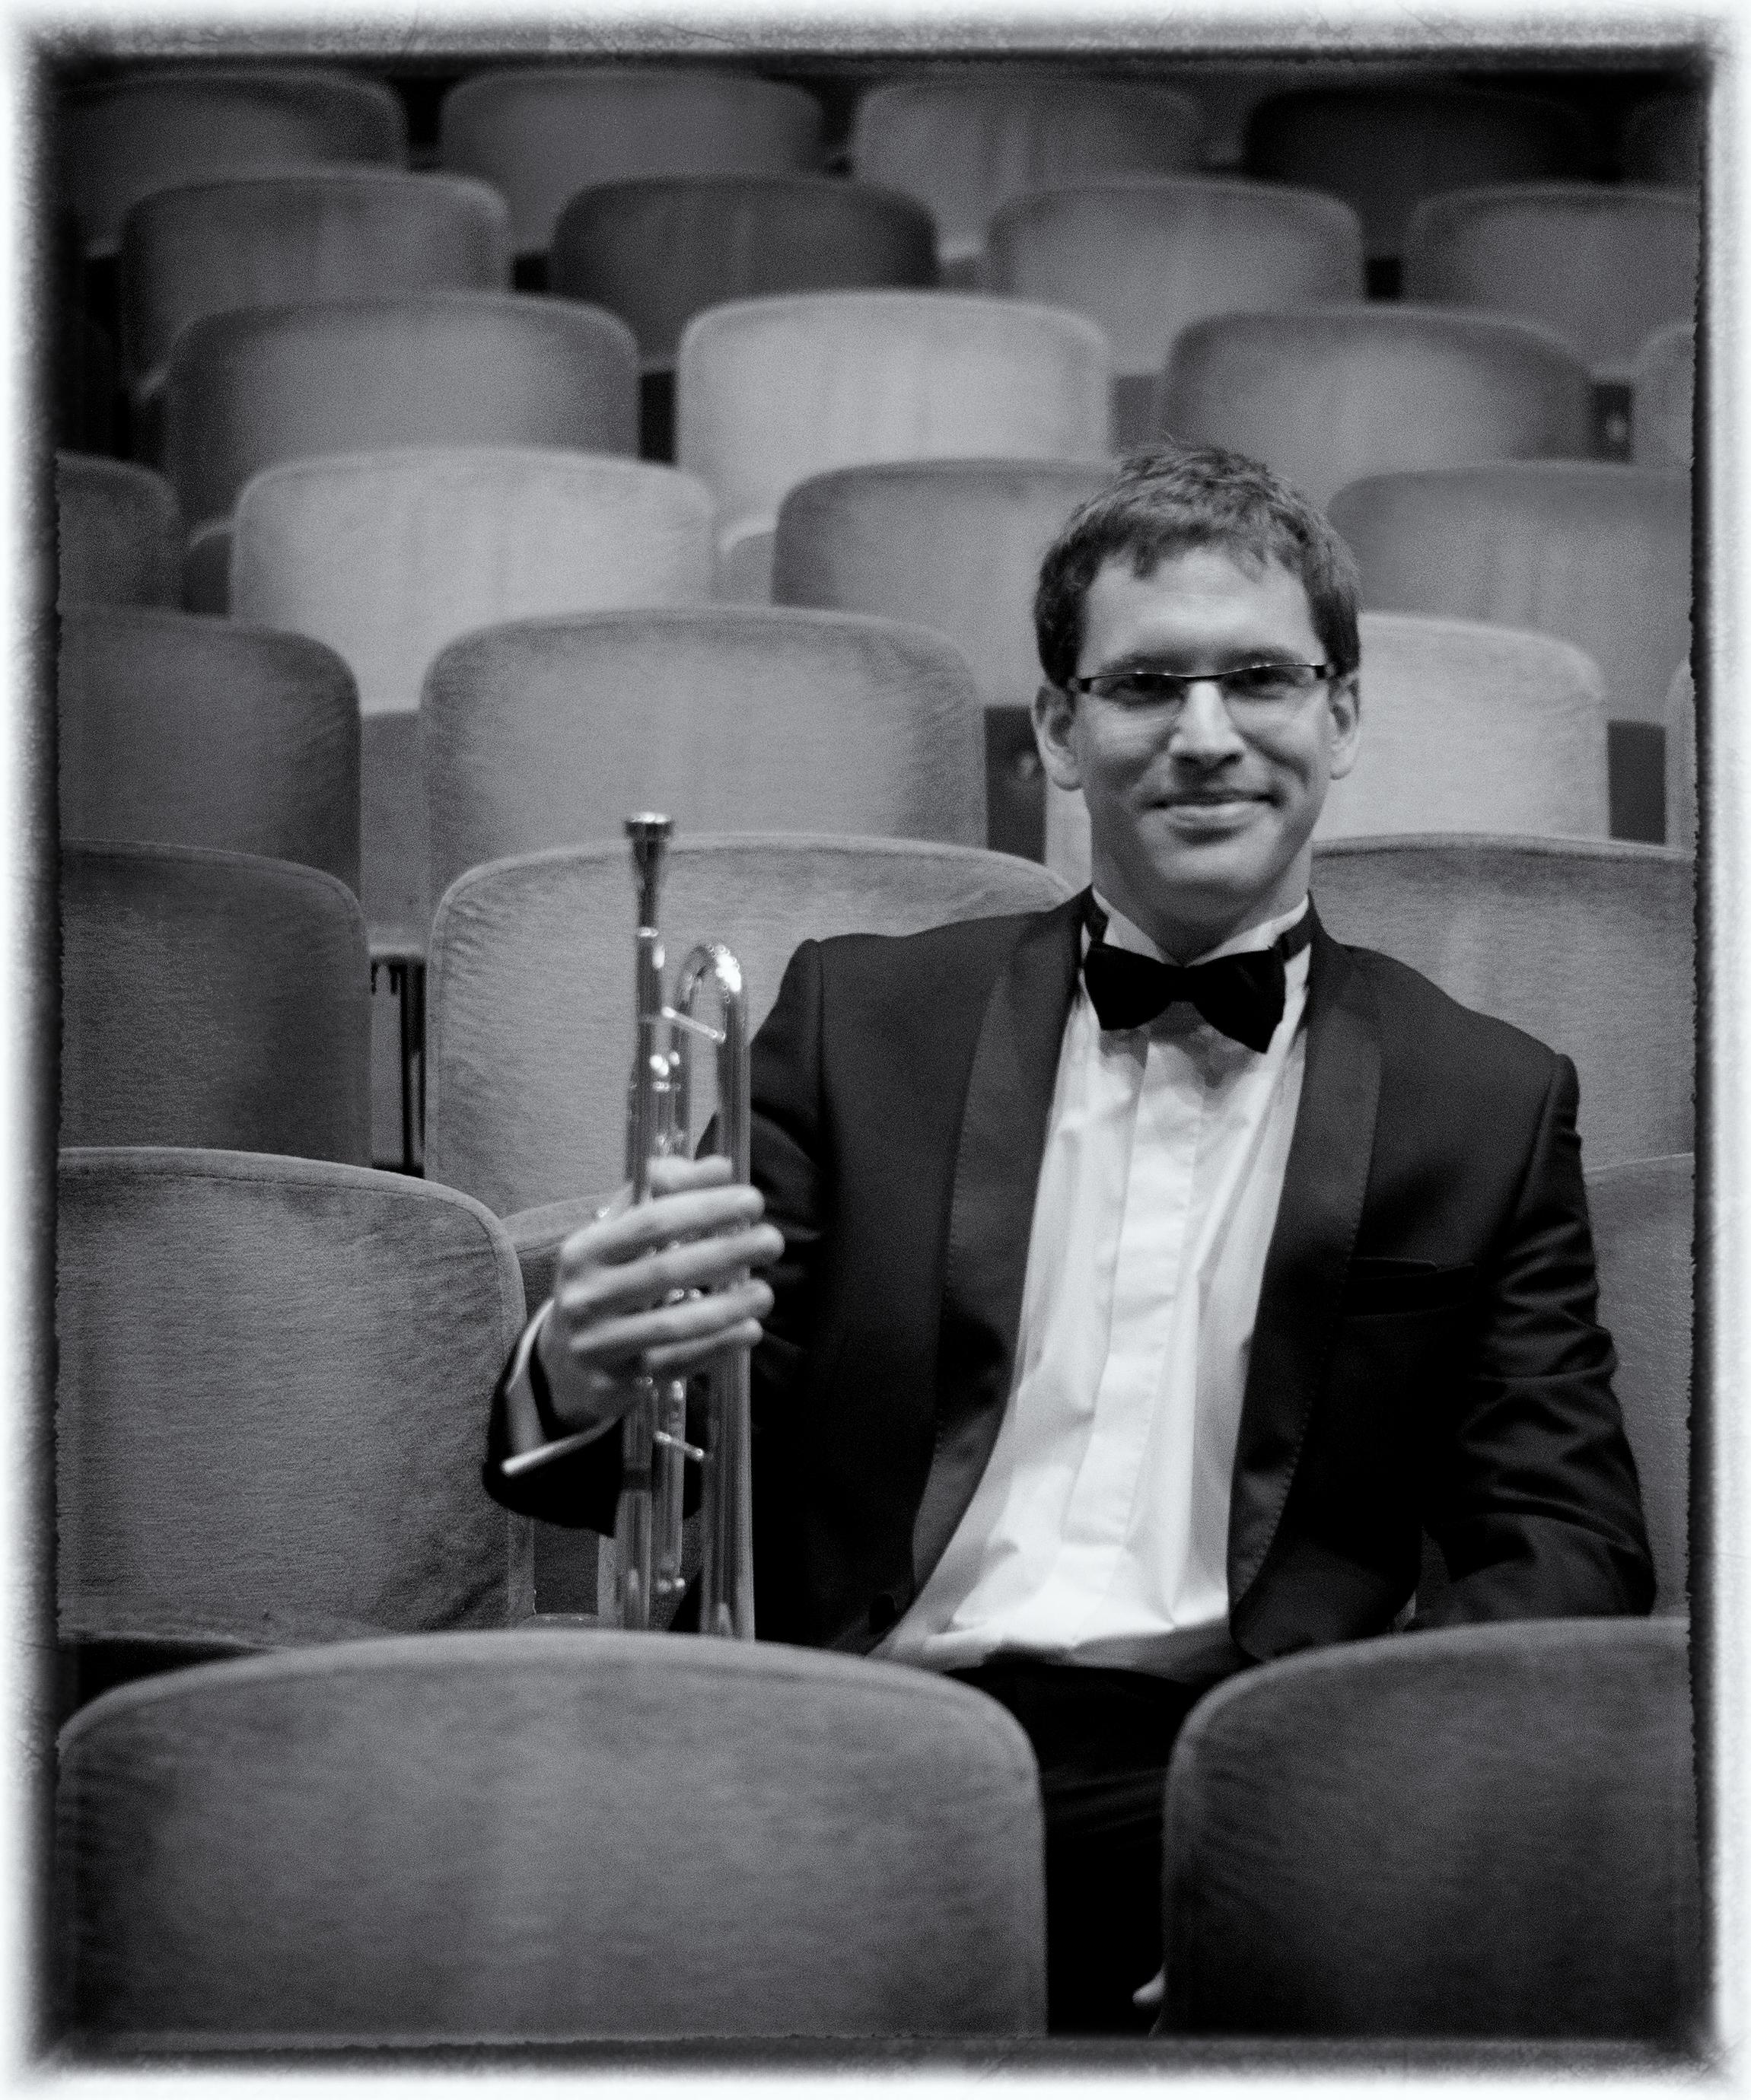 Matthew Shenton - Trumpet